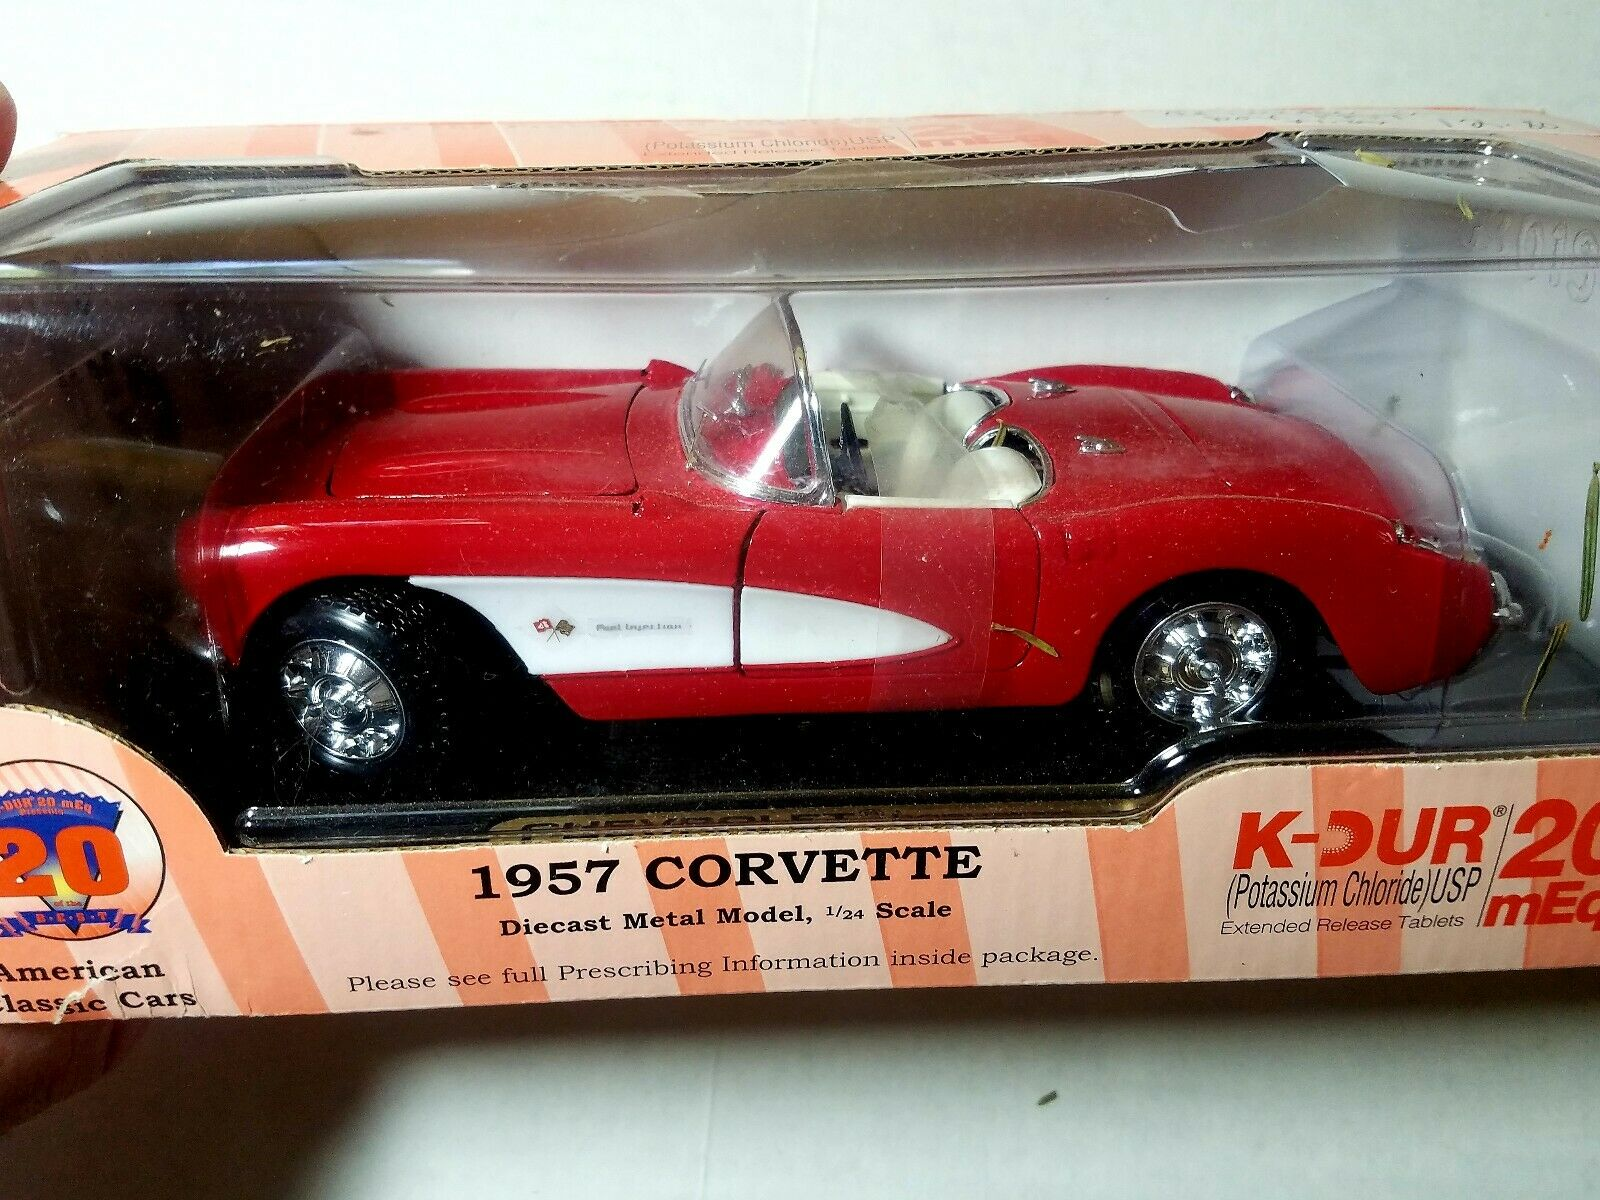 American Classic Cars 1957 Corvette 1:24 Diecast Metal Model